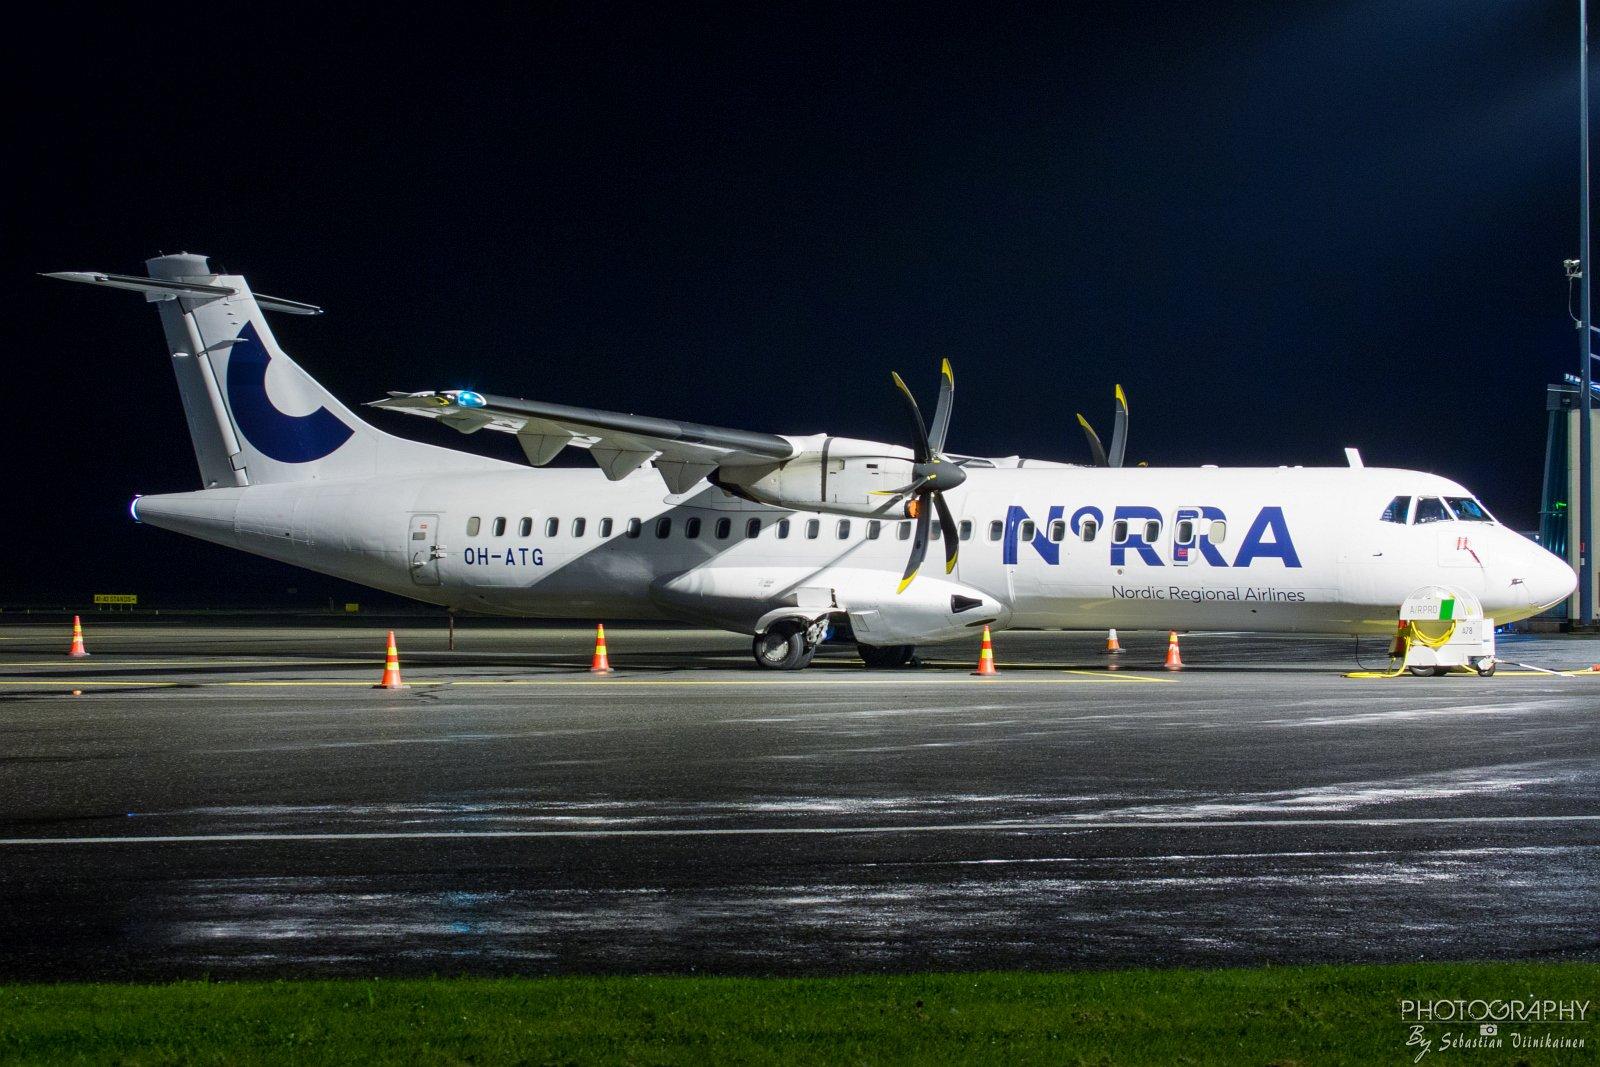 OH-ATG Norra ATR 72-500, 09.09.2017